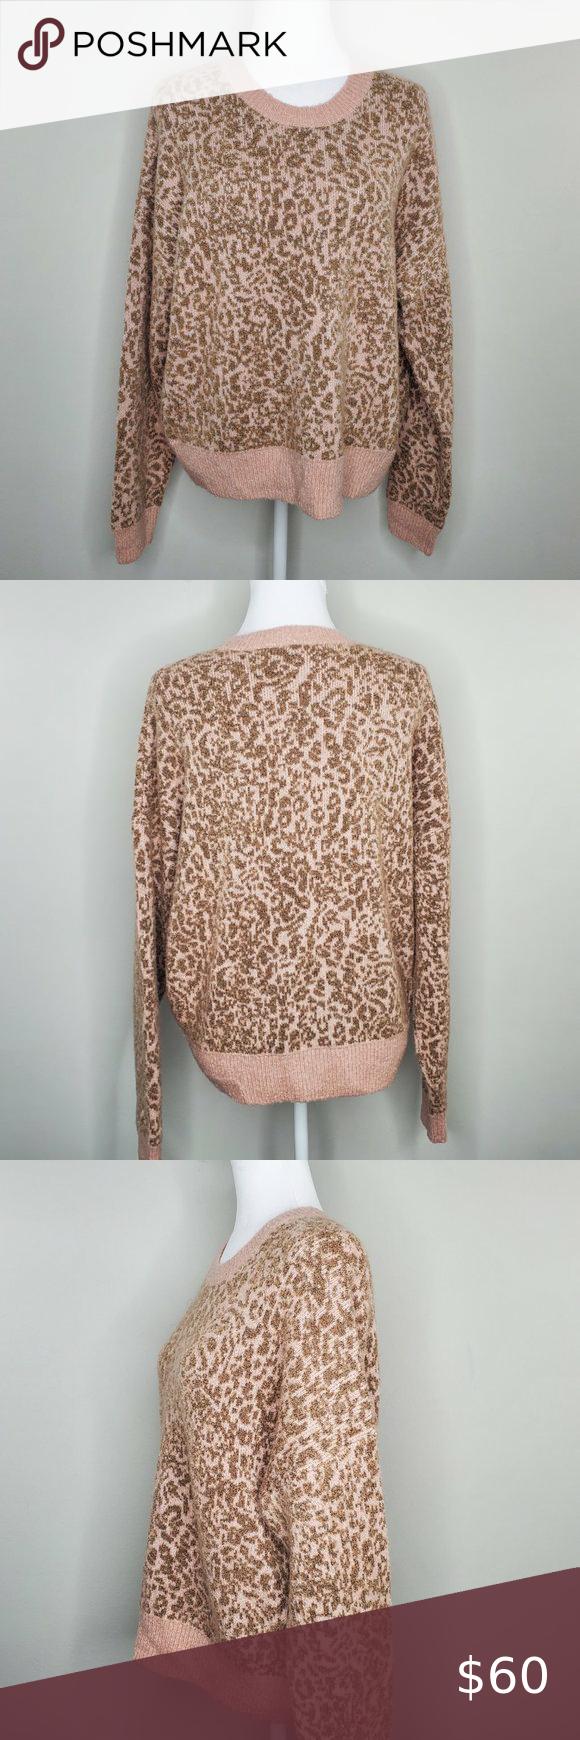 Madewell Leopard Print Crewneck Pullover Sweater Pullover Sweaters Leopard Print Madewell Sweater [ 1740 x 580 Pixel ]